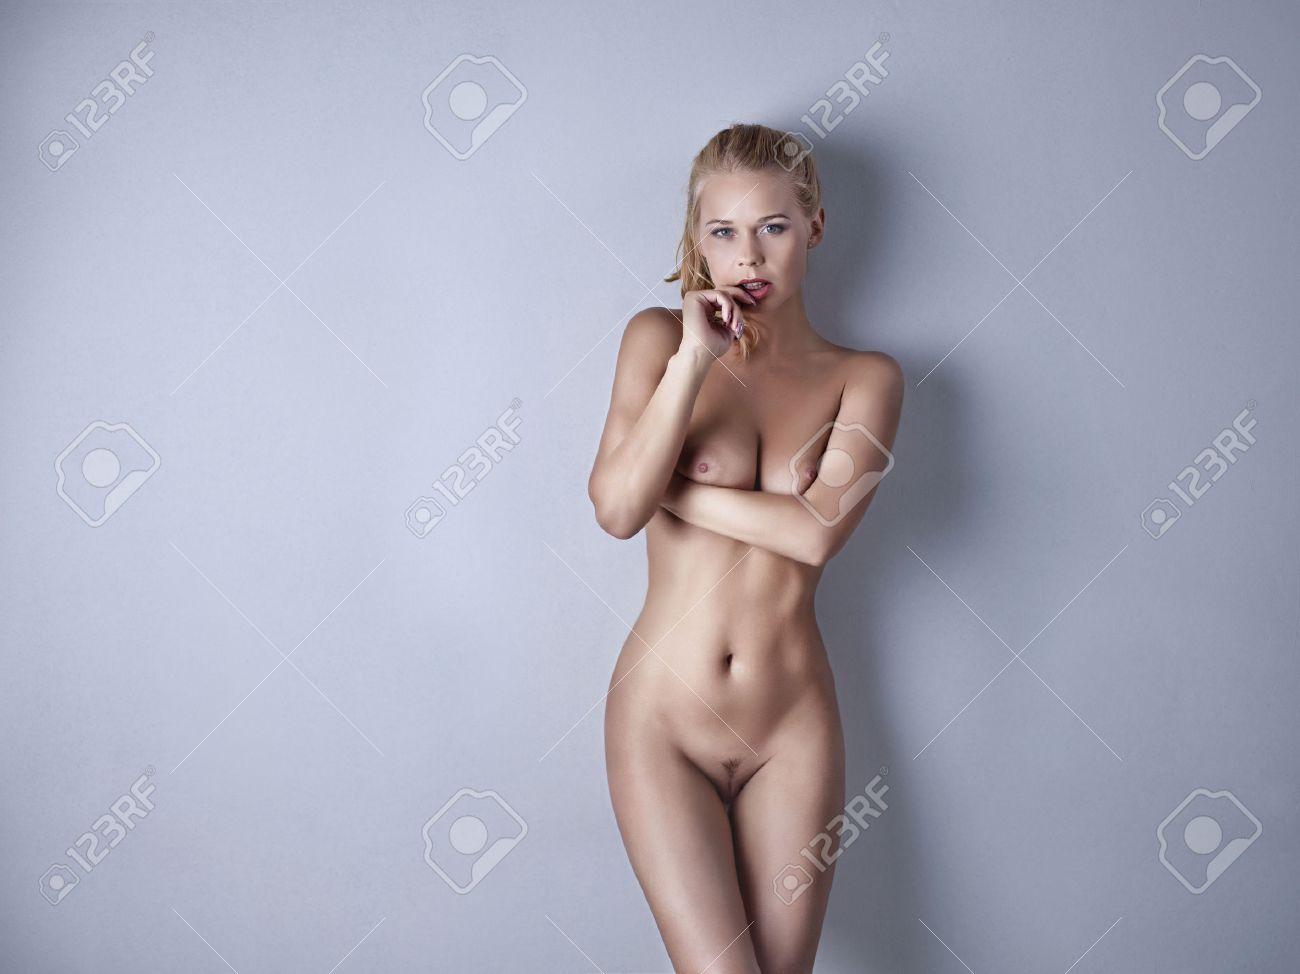 Real sex in public porn